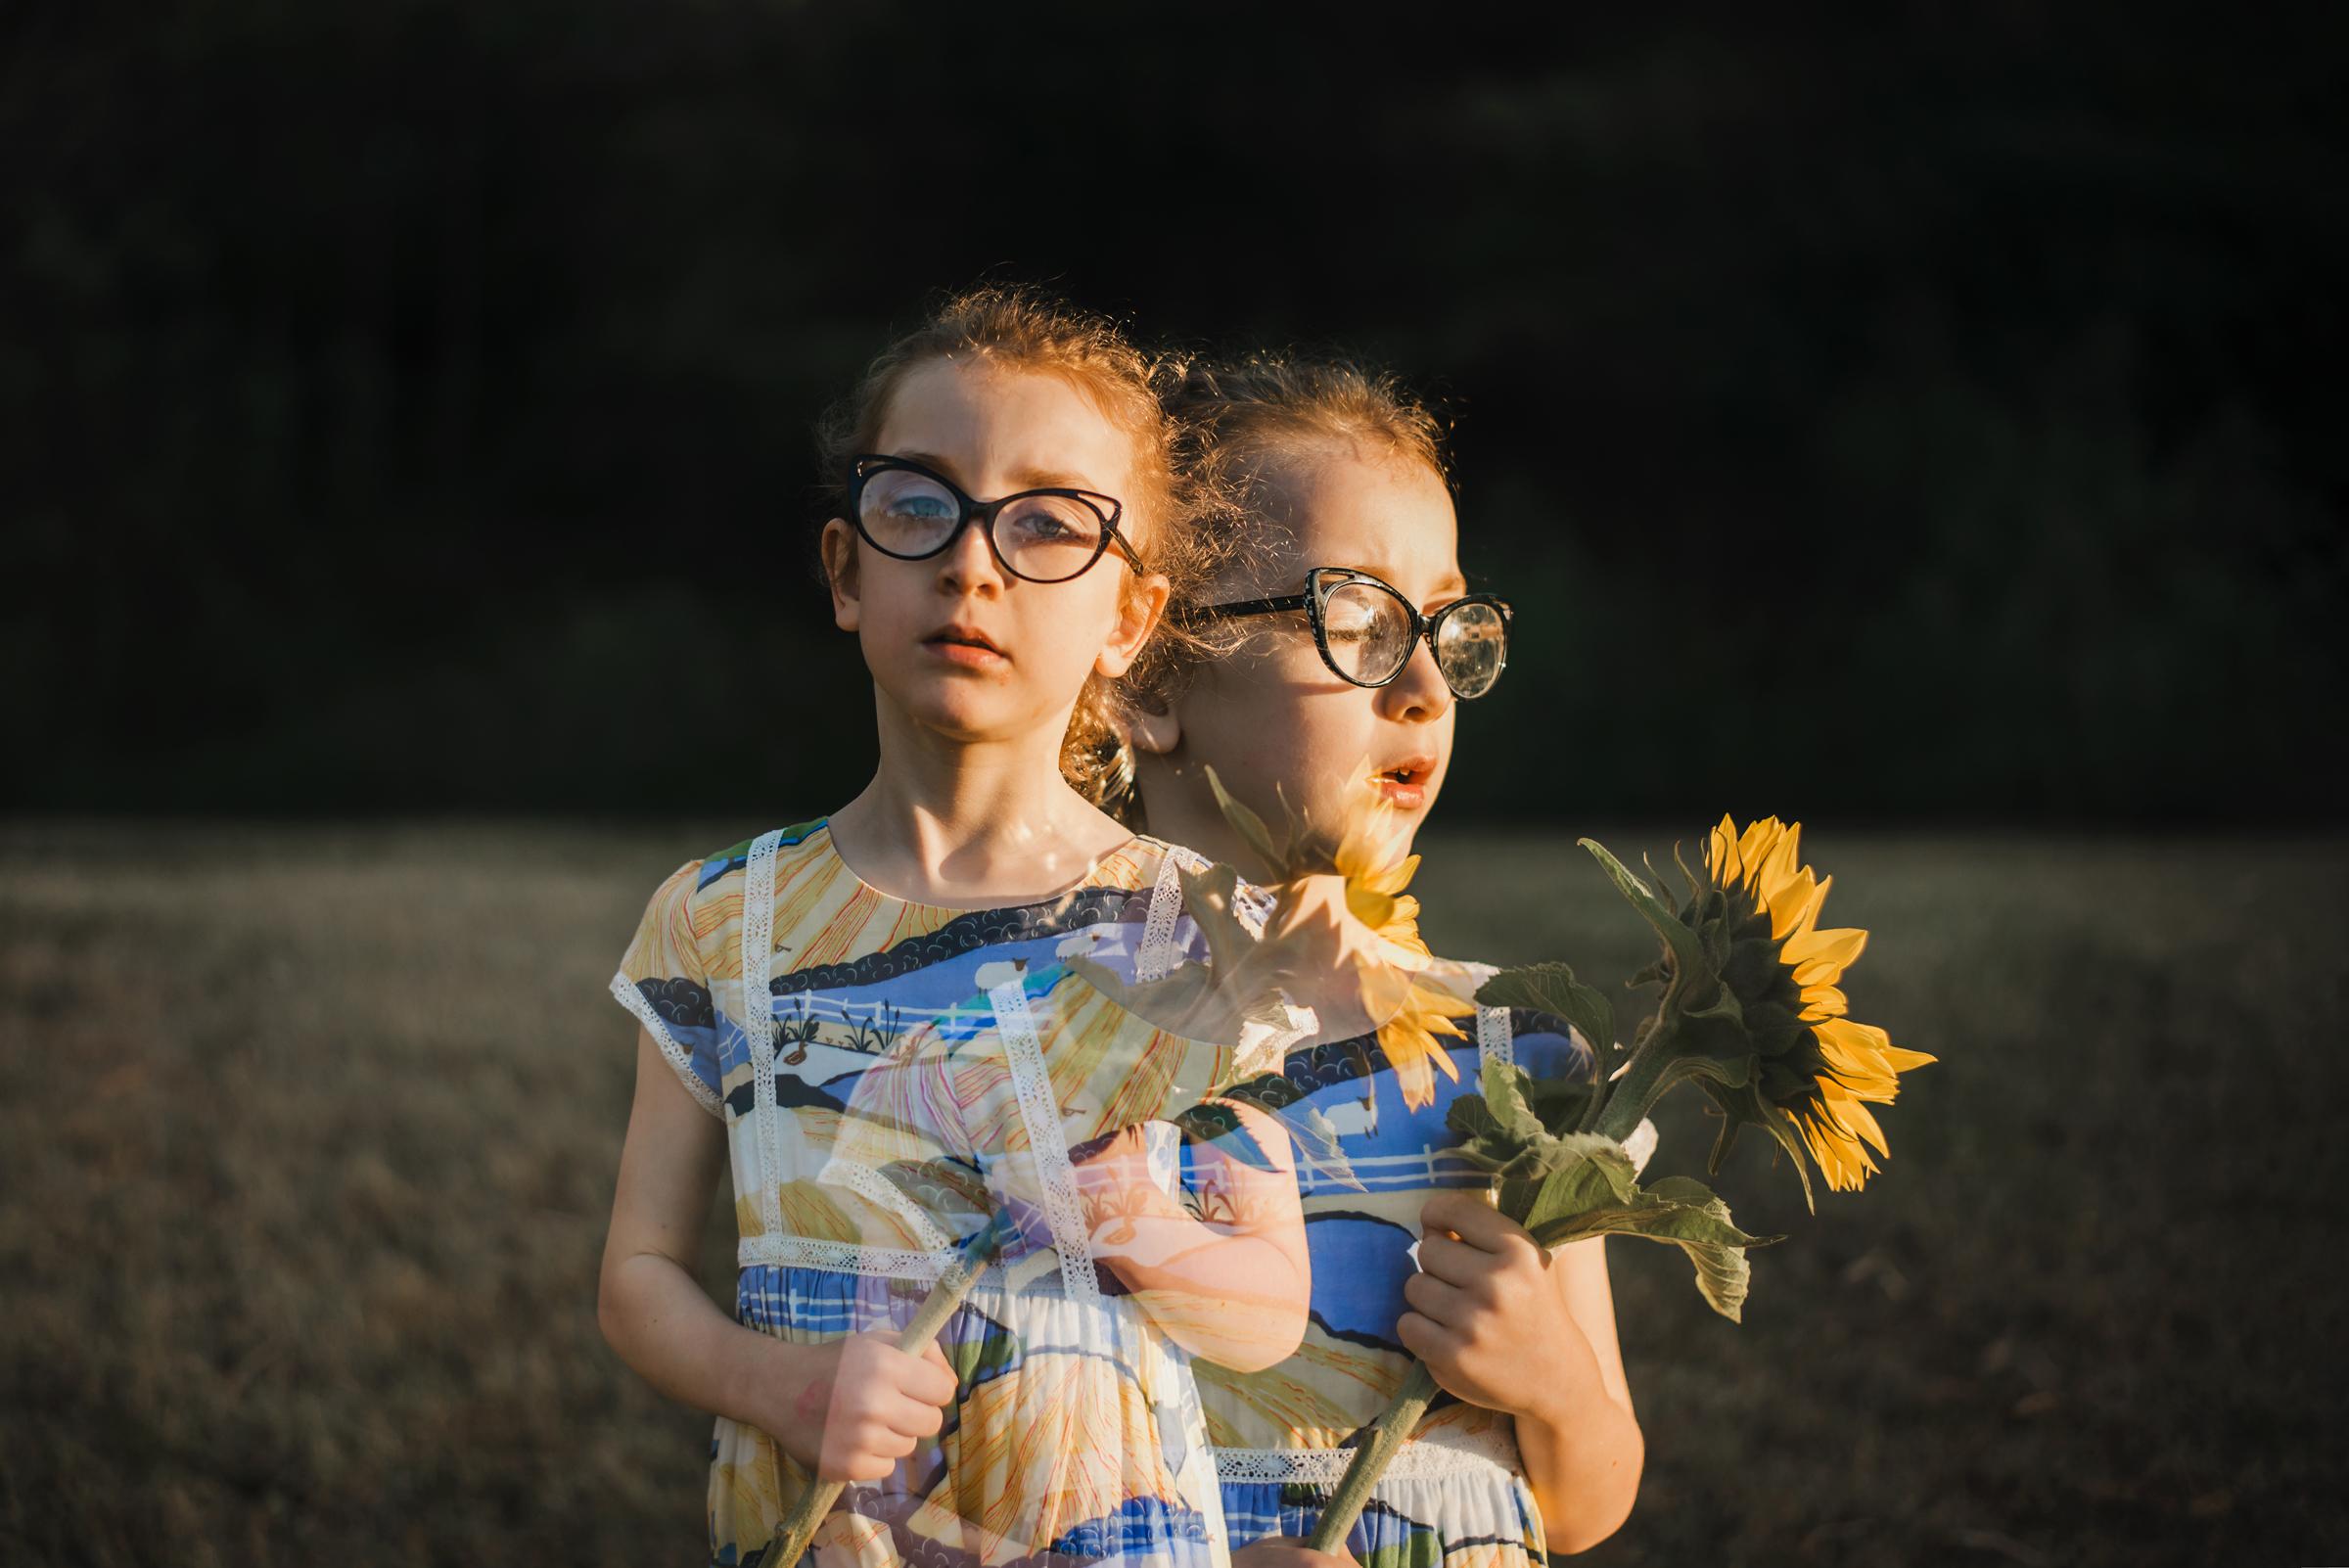 creative_portrait_of_Brisbane_girl_and_sunflower.jpg